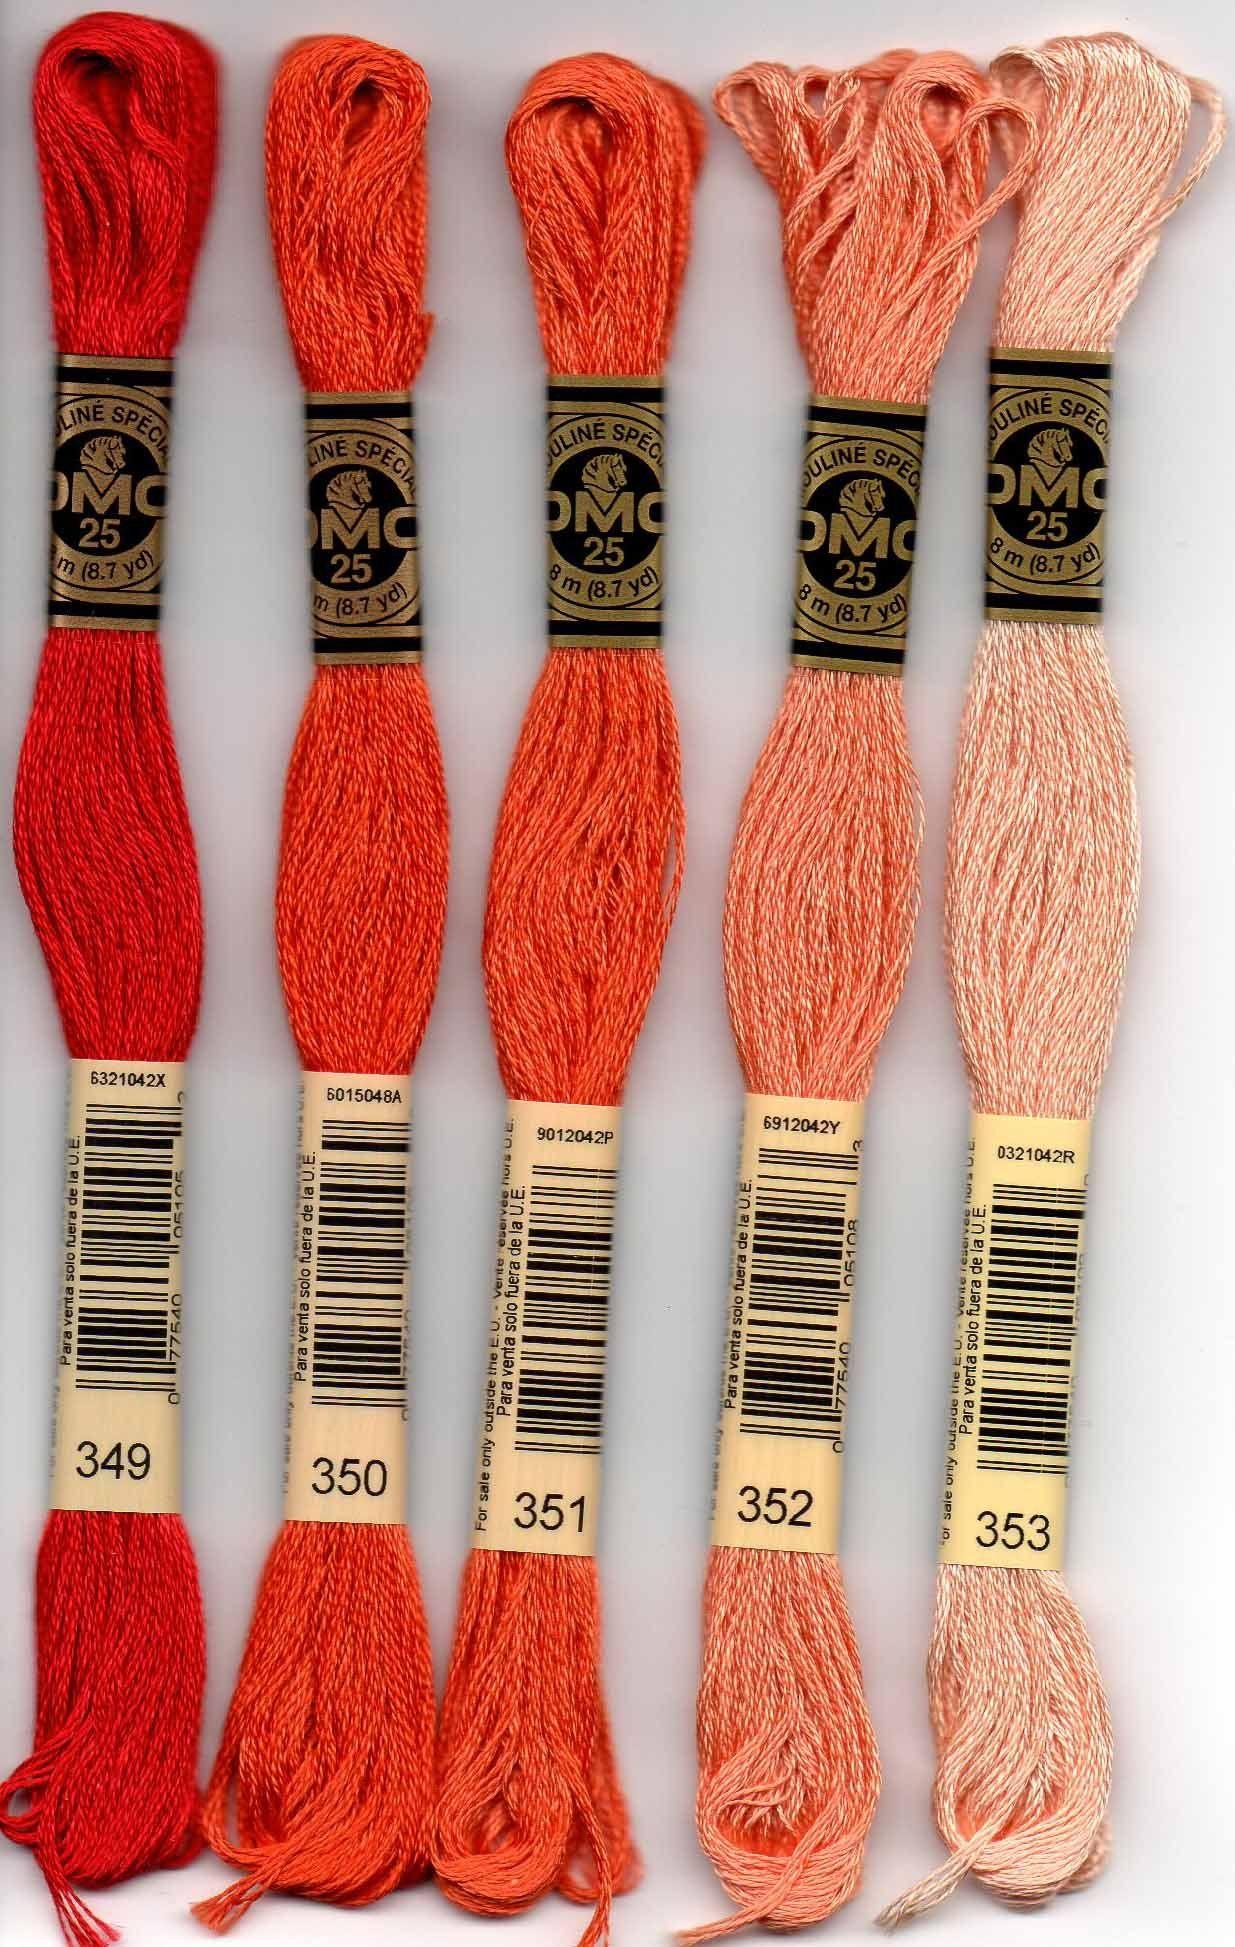 Colour 356 Medium Terra Cotta DMC Stranded Cotton Embroidery Floss